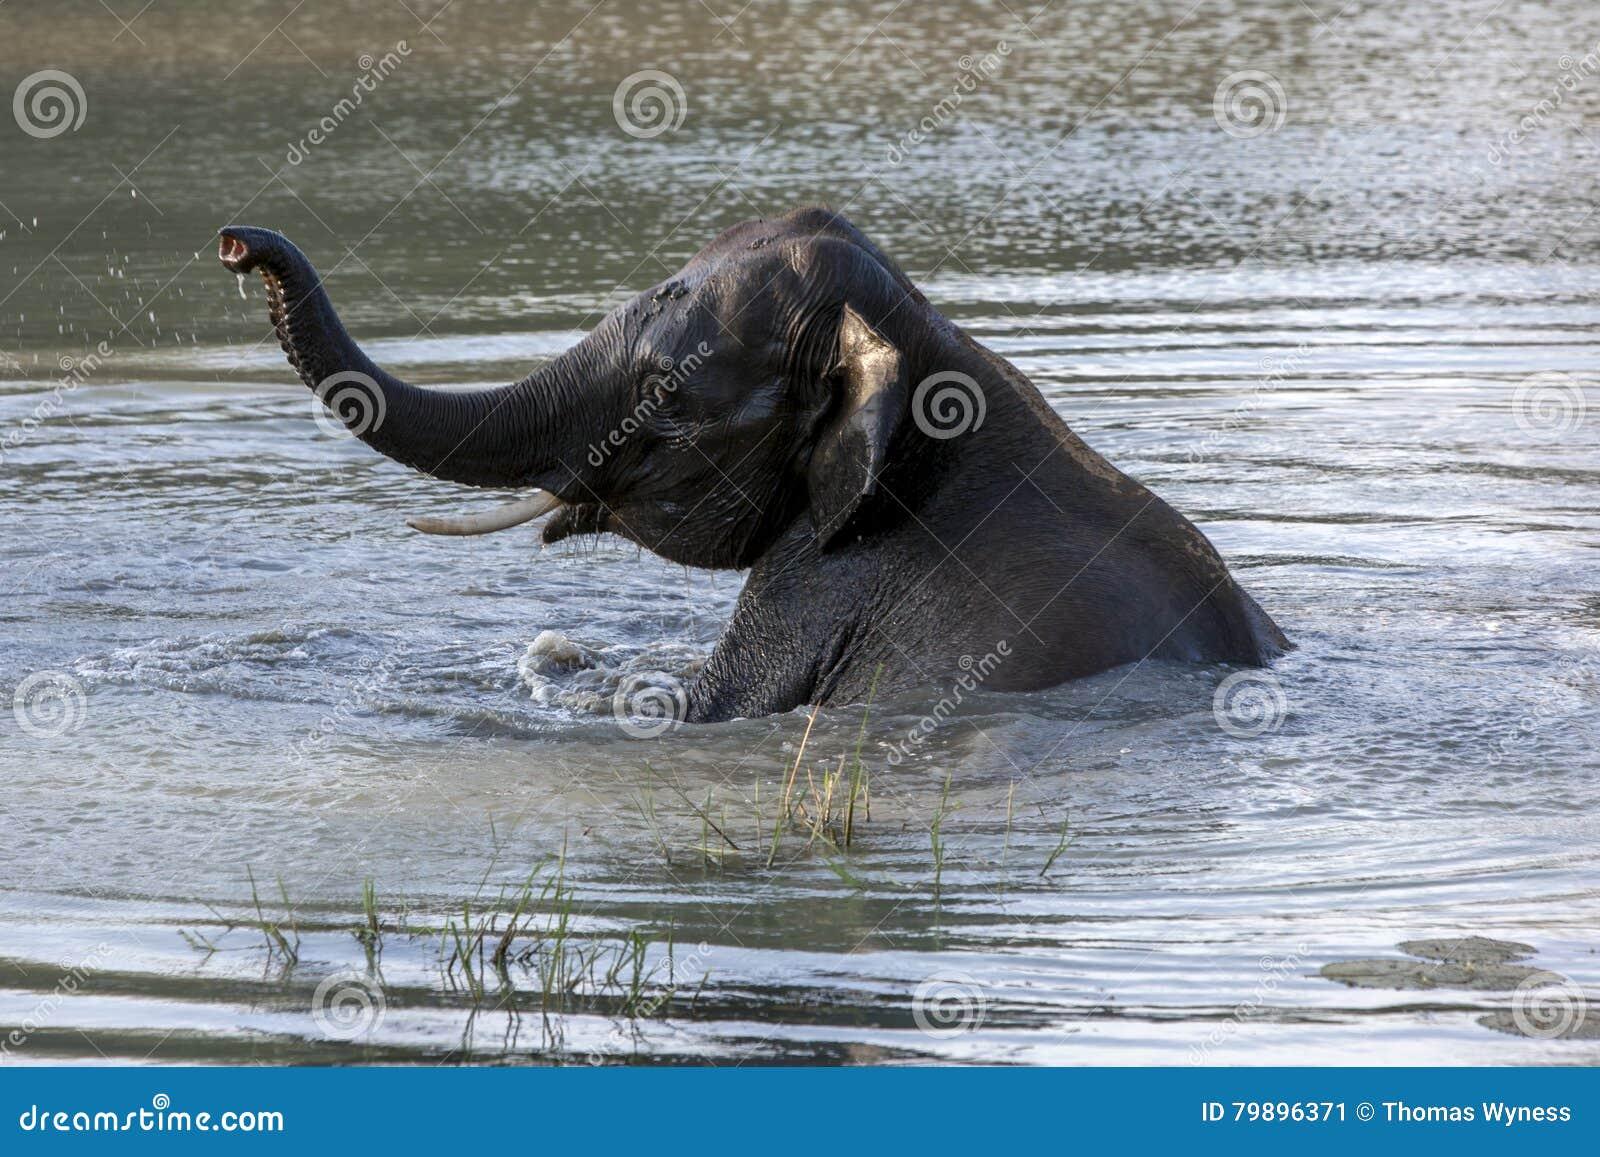 An elephant enjoys a bath in a water hole in Yala National Park near Tissamaharama in Sri Lanka.